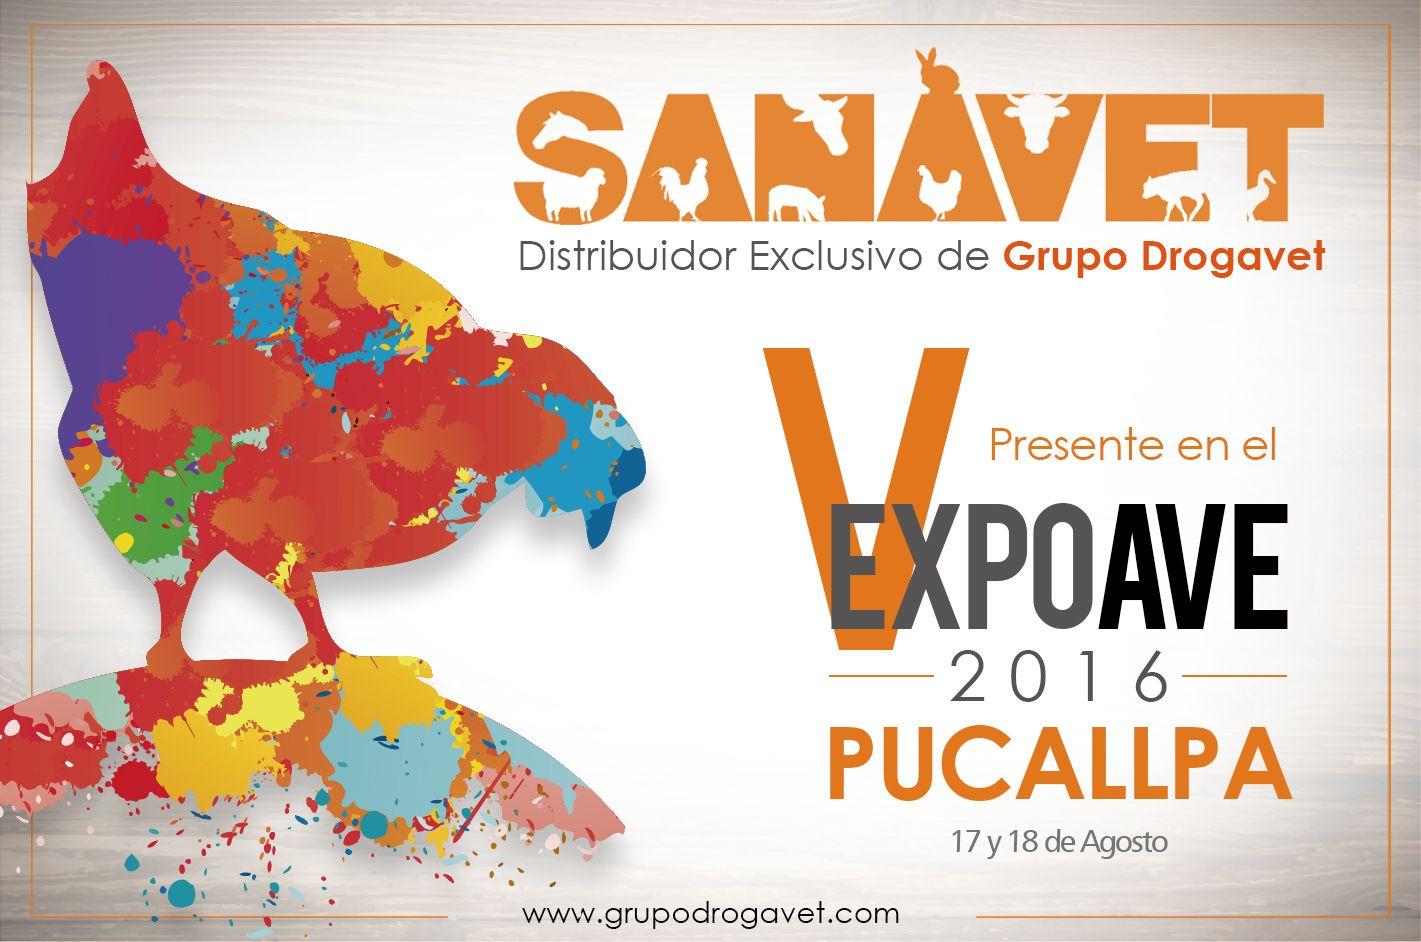 SANAVET distribuidor exclusivo de Grupo Drogavet participará en la V EXPOAVE 2016 – Pucallpa